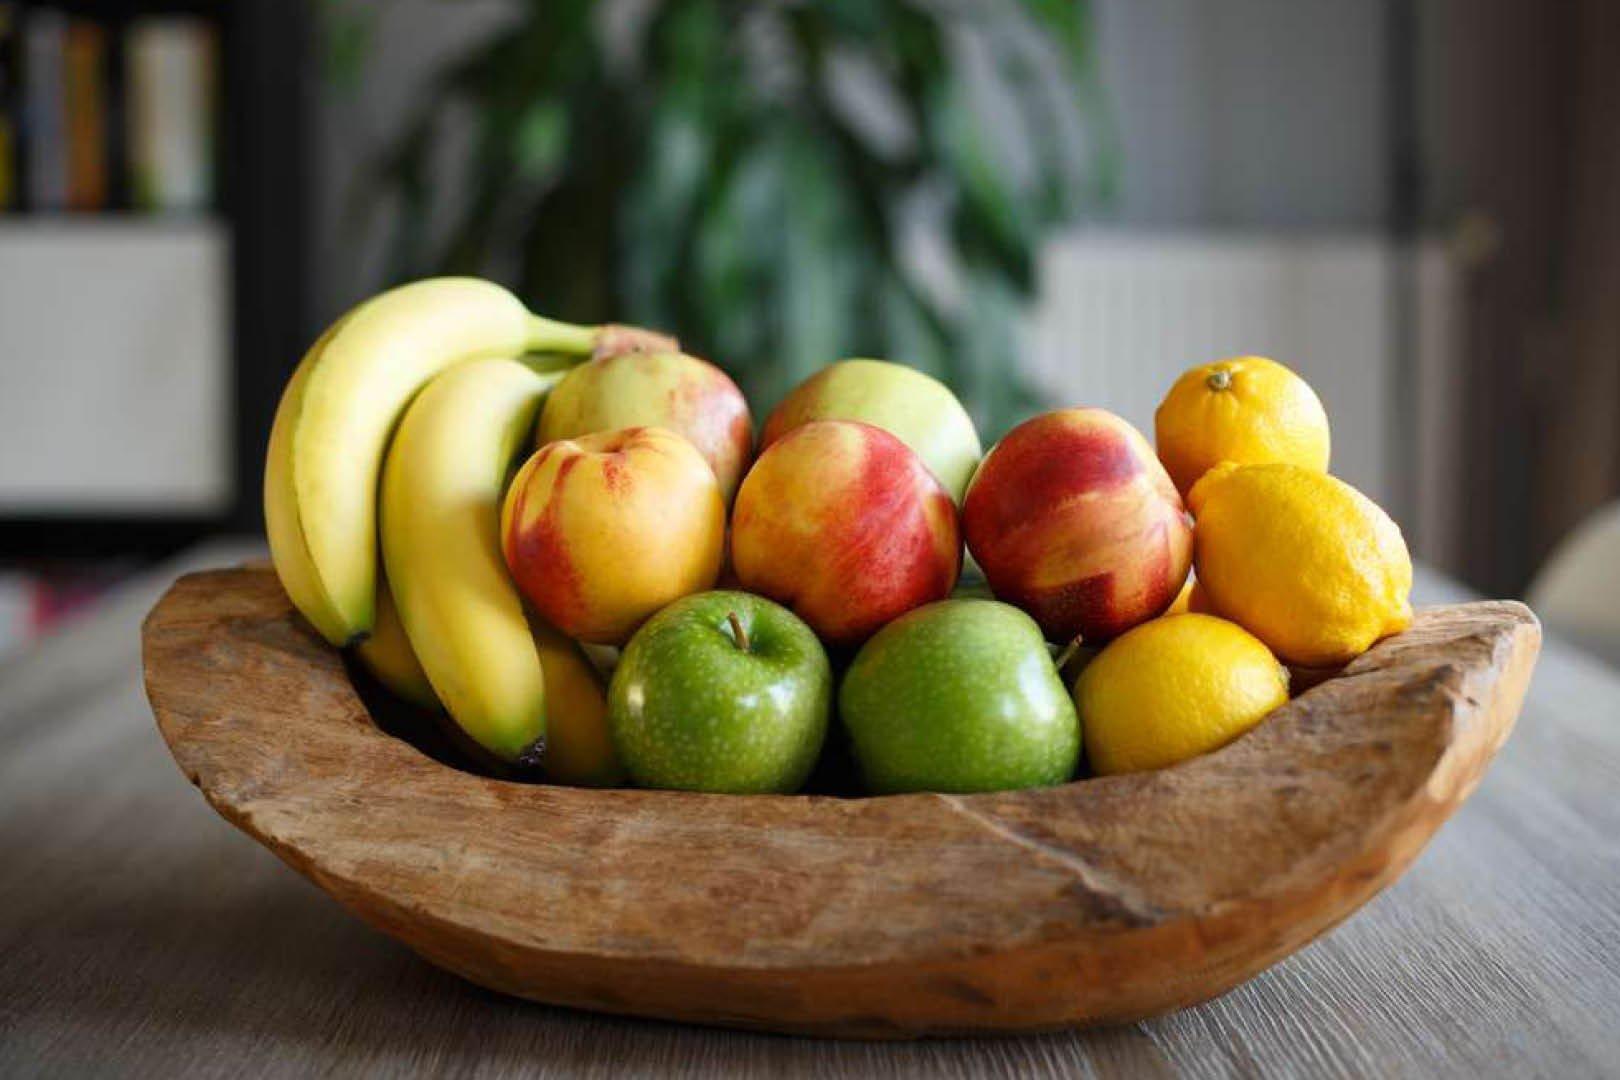 fruits-trop-mûrs-abîmés